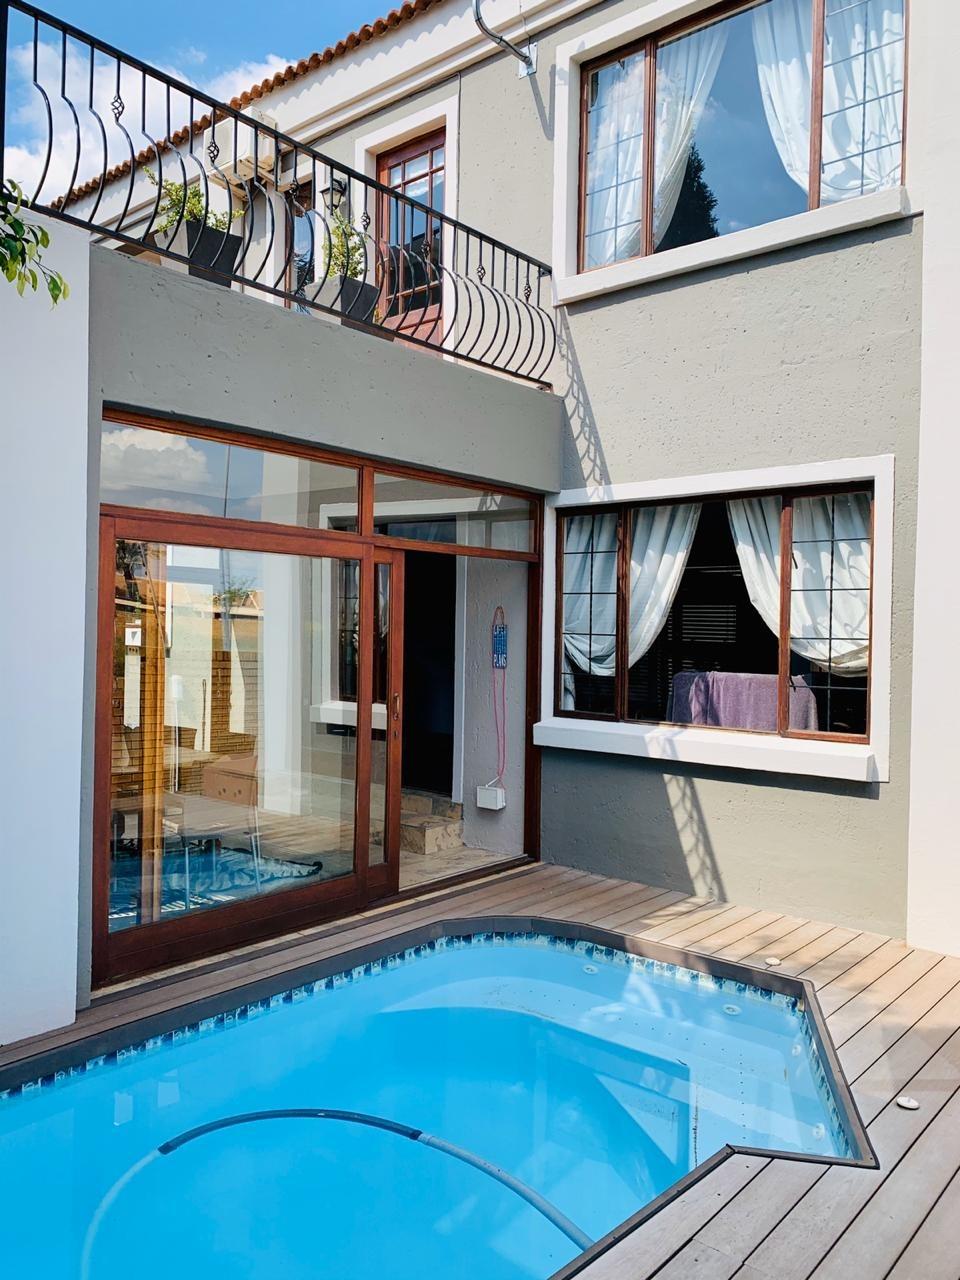 Stunning 3 bedroom